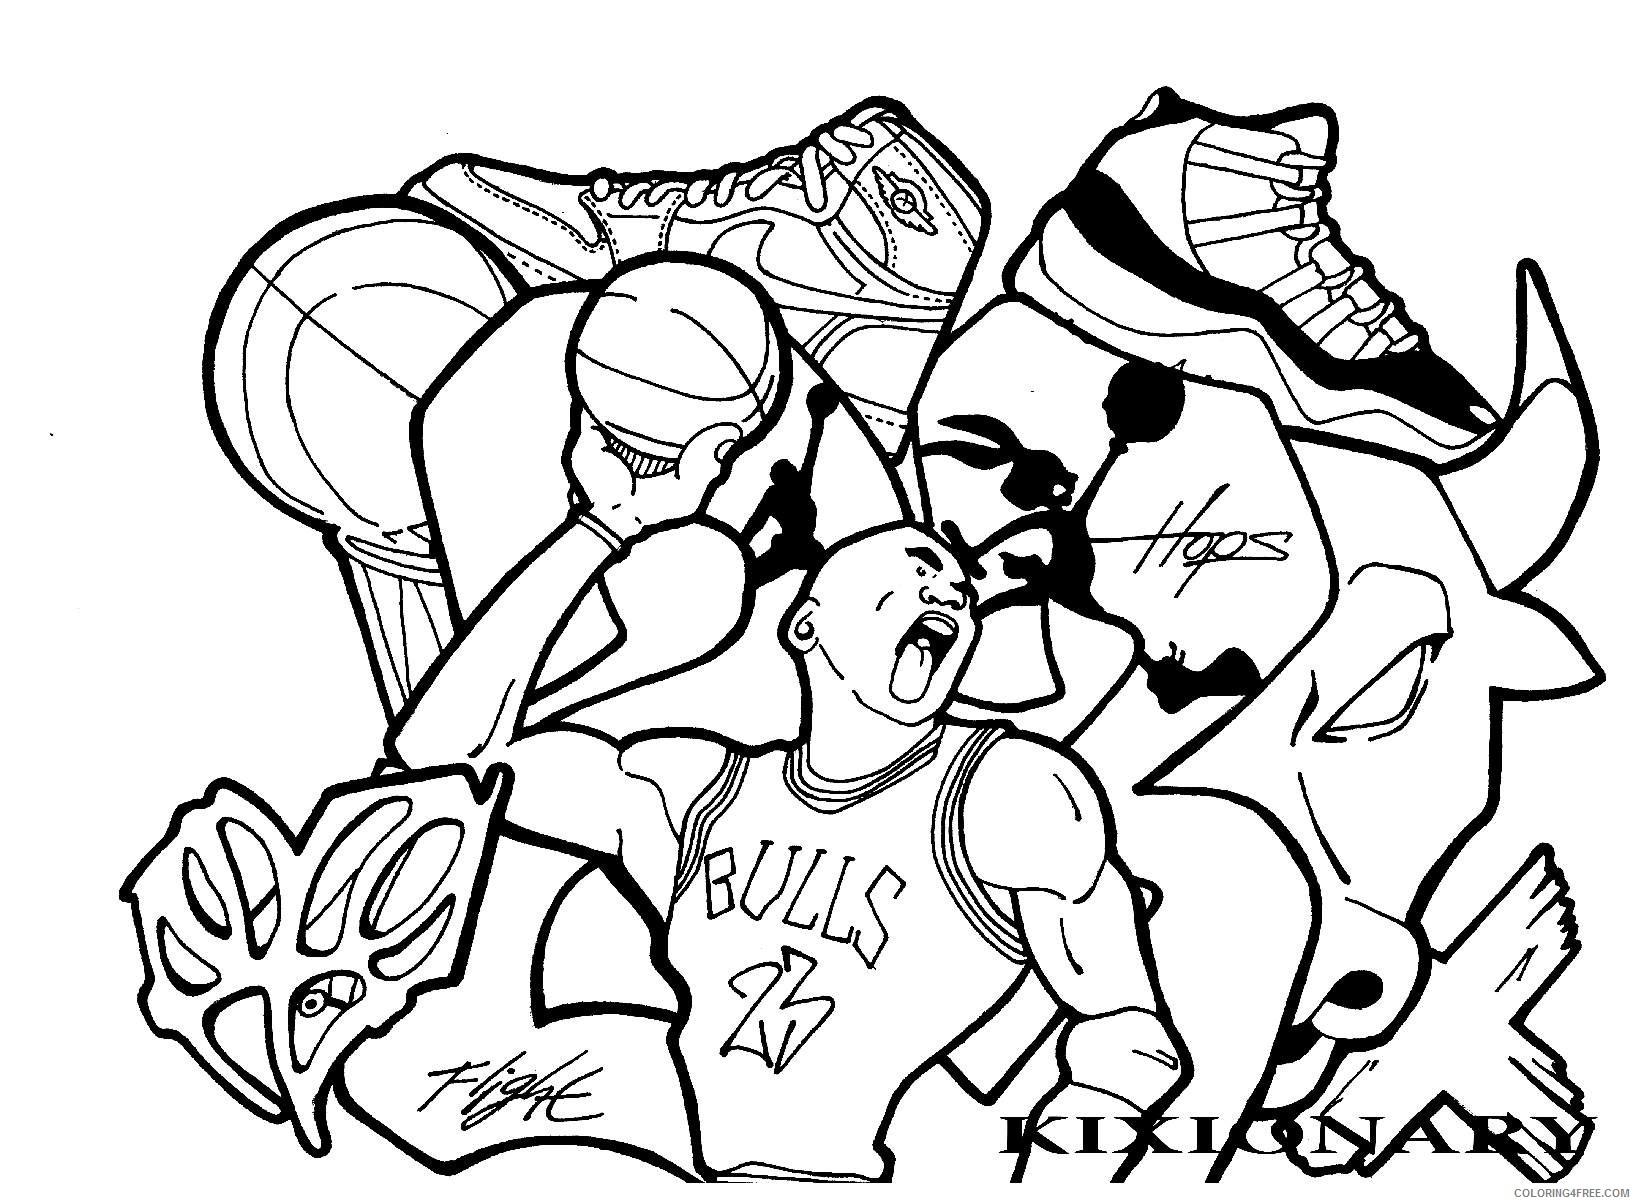 1636x1204 Graffiti Basketball Drawing Graffiti Coloring Pages Basketball By